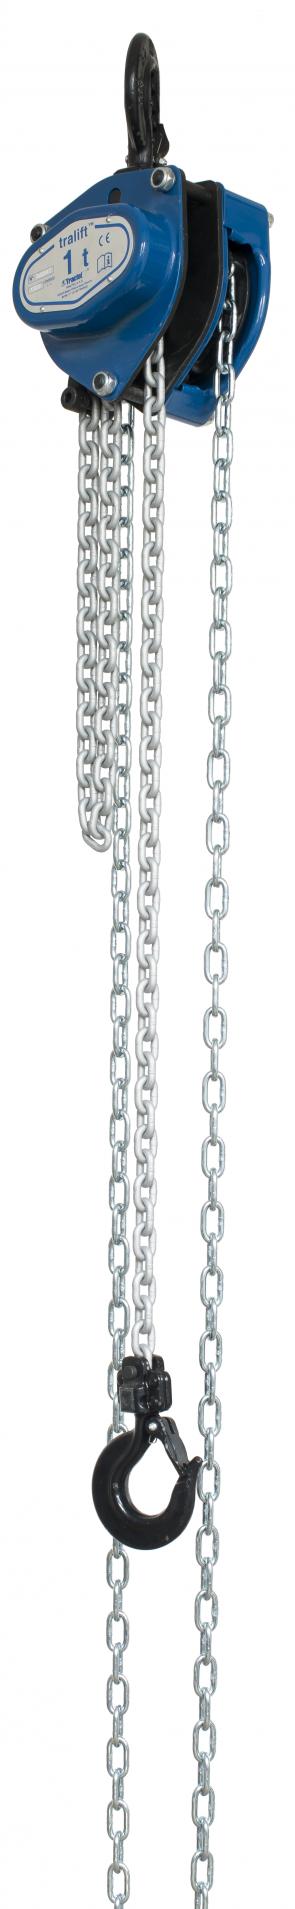 250kg Tralift Chain Block with 3m Corolim Chain